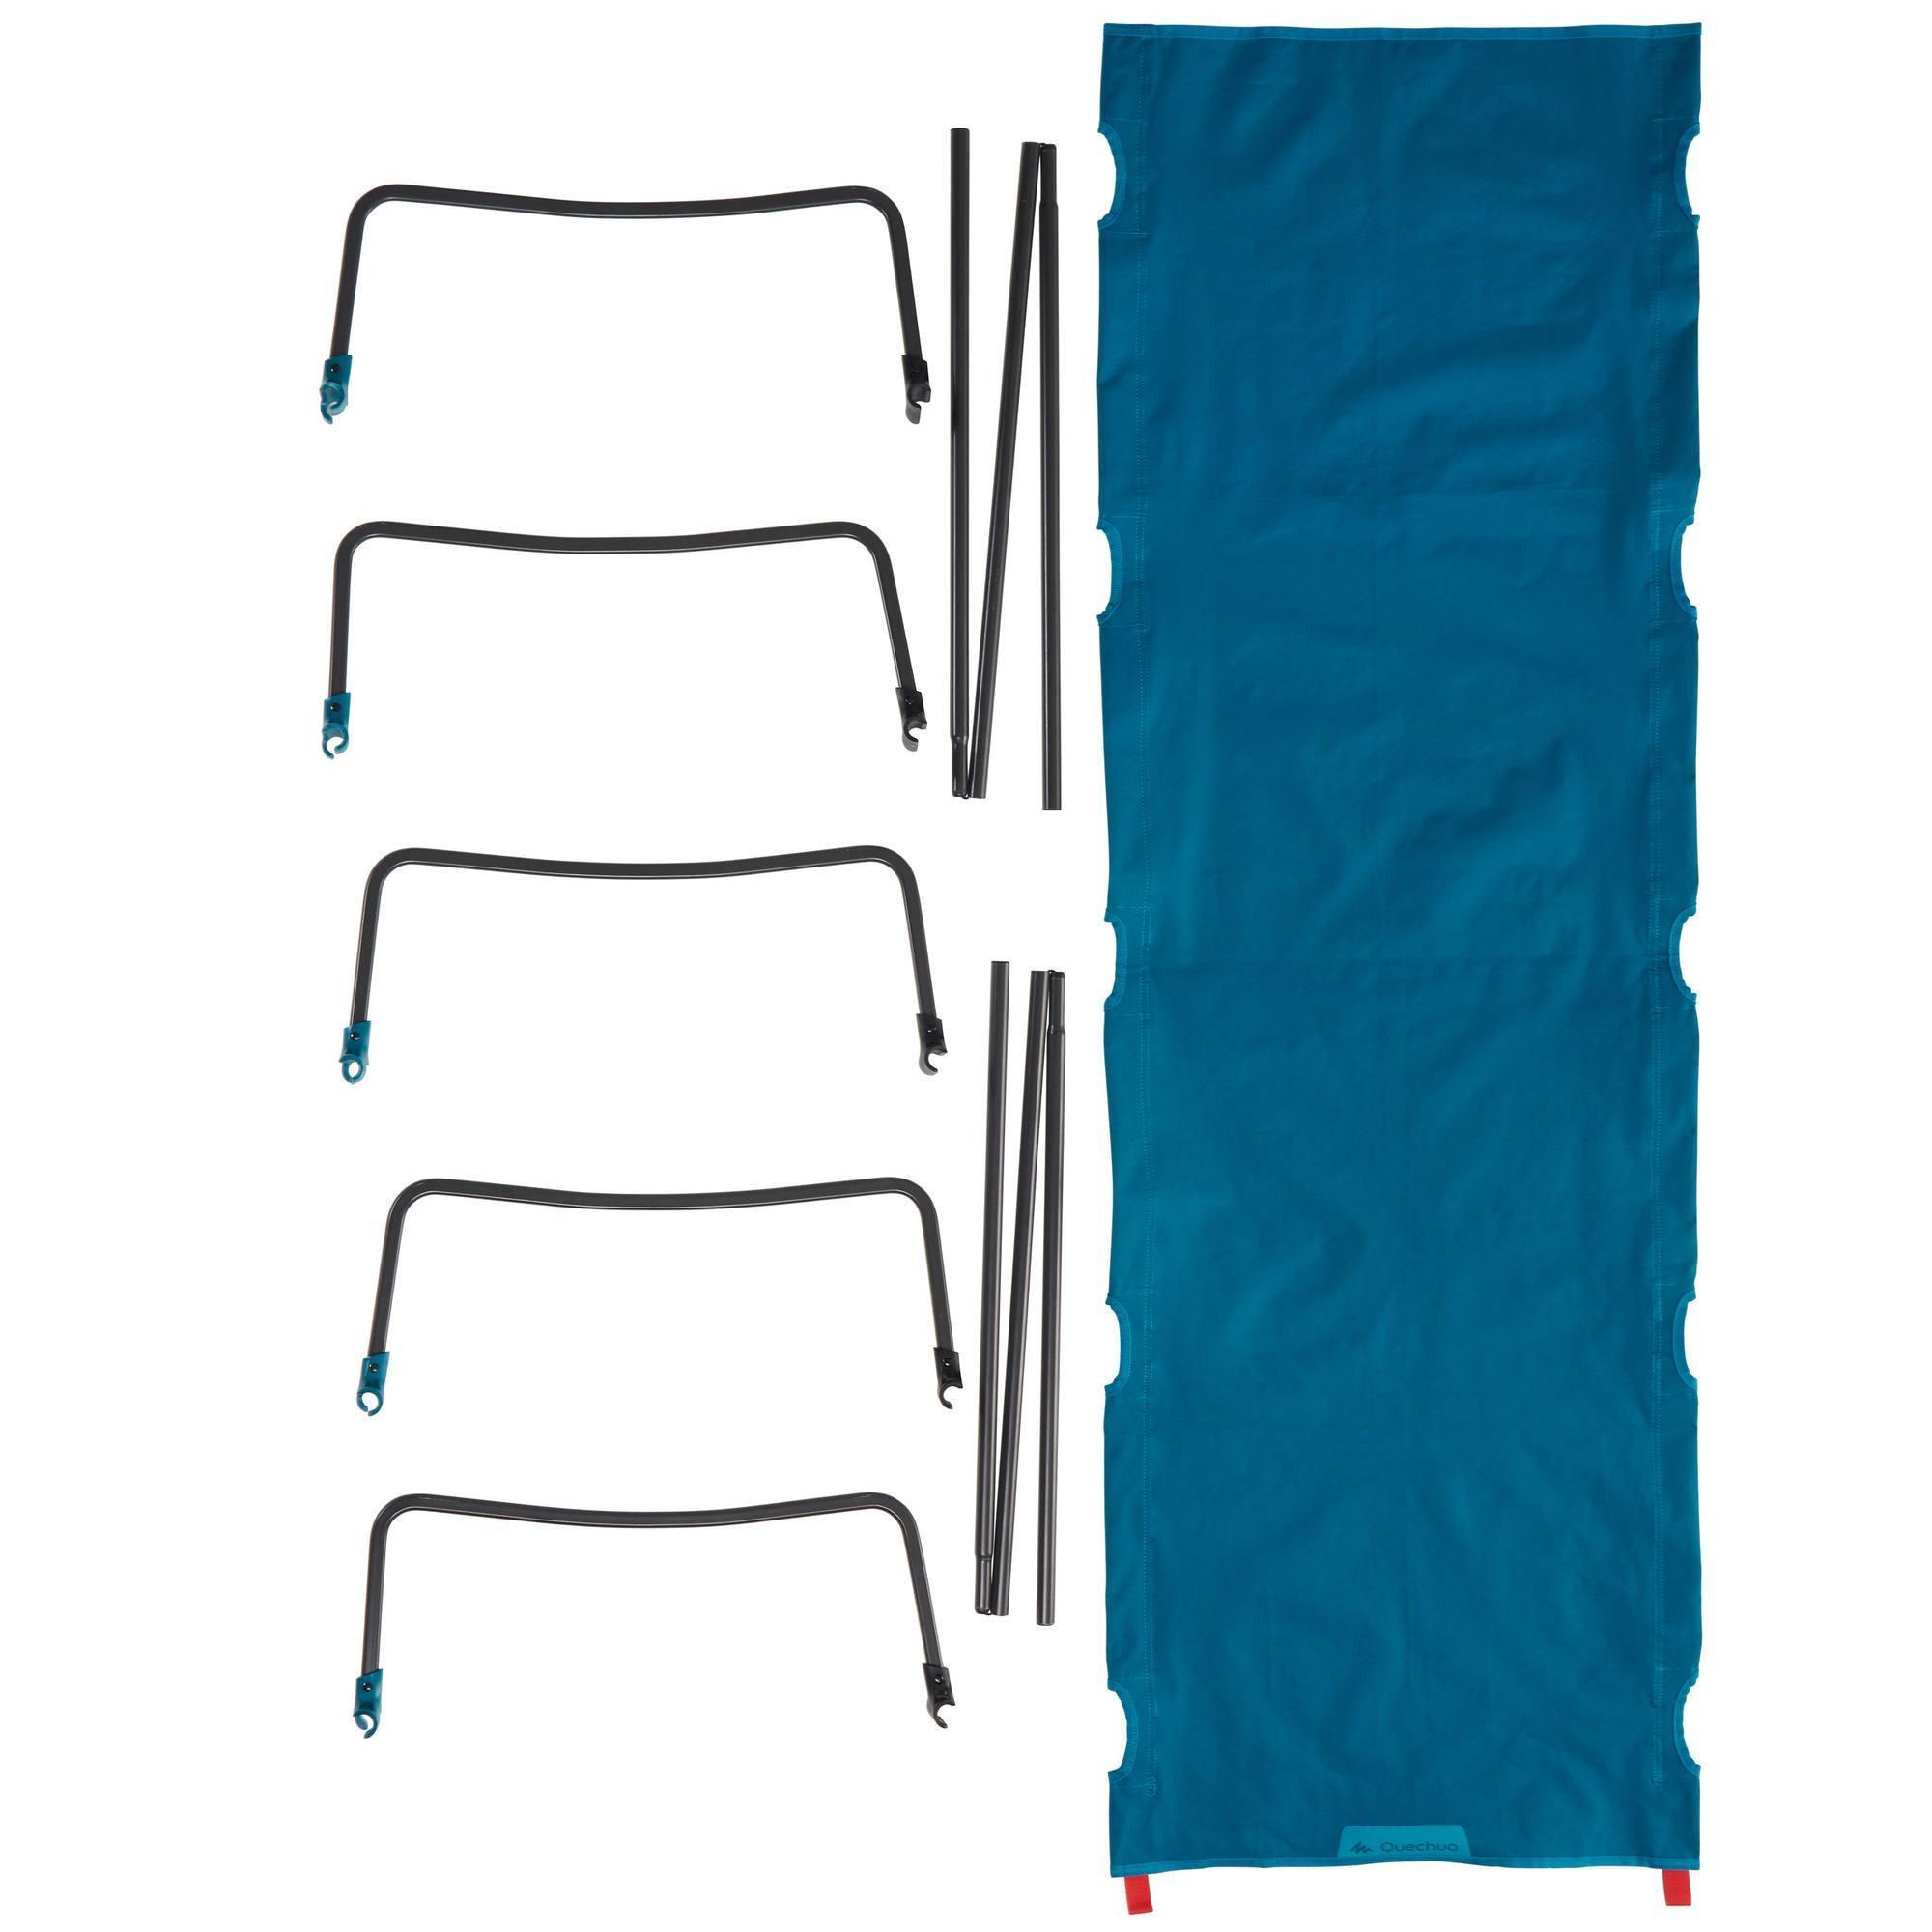 lit de camp 1 personne camp bed 60 clubs collectivit s decathlon pro. Black Bedroom Furniture Sets. Home Design Ideas